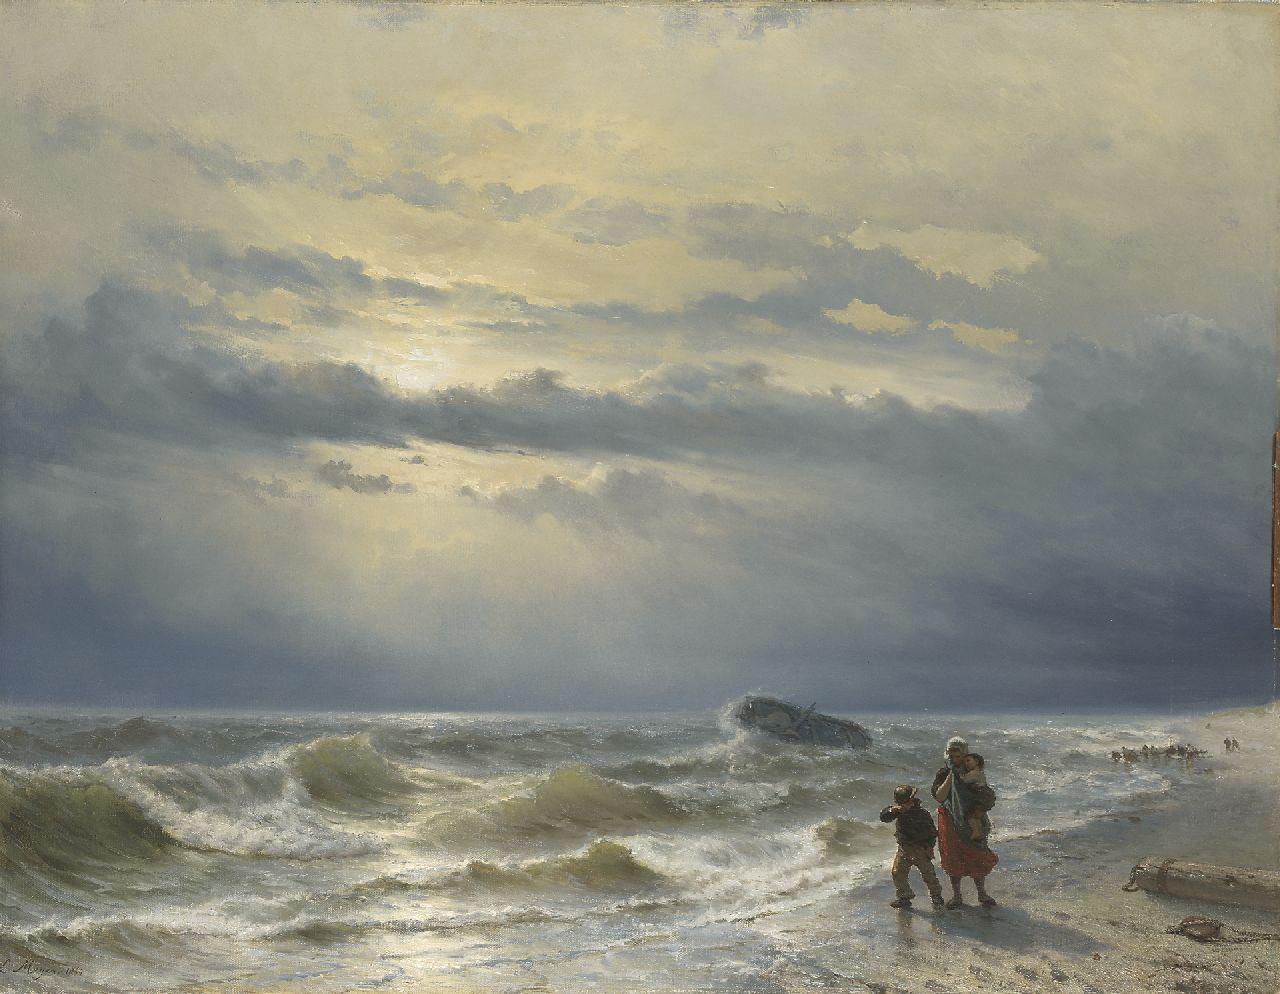 Meijer, J.H.L. - Na de schipbreuk, olieverf op doek 88,8 x 115,4 cm, gesigneerd l.o. en gedateerd 1864